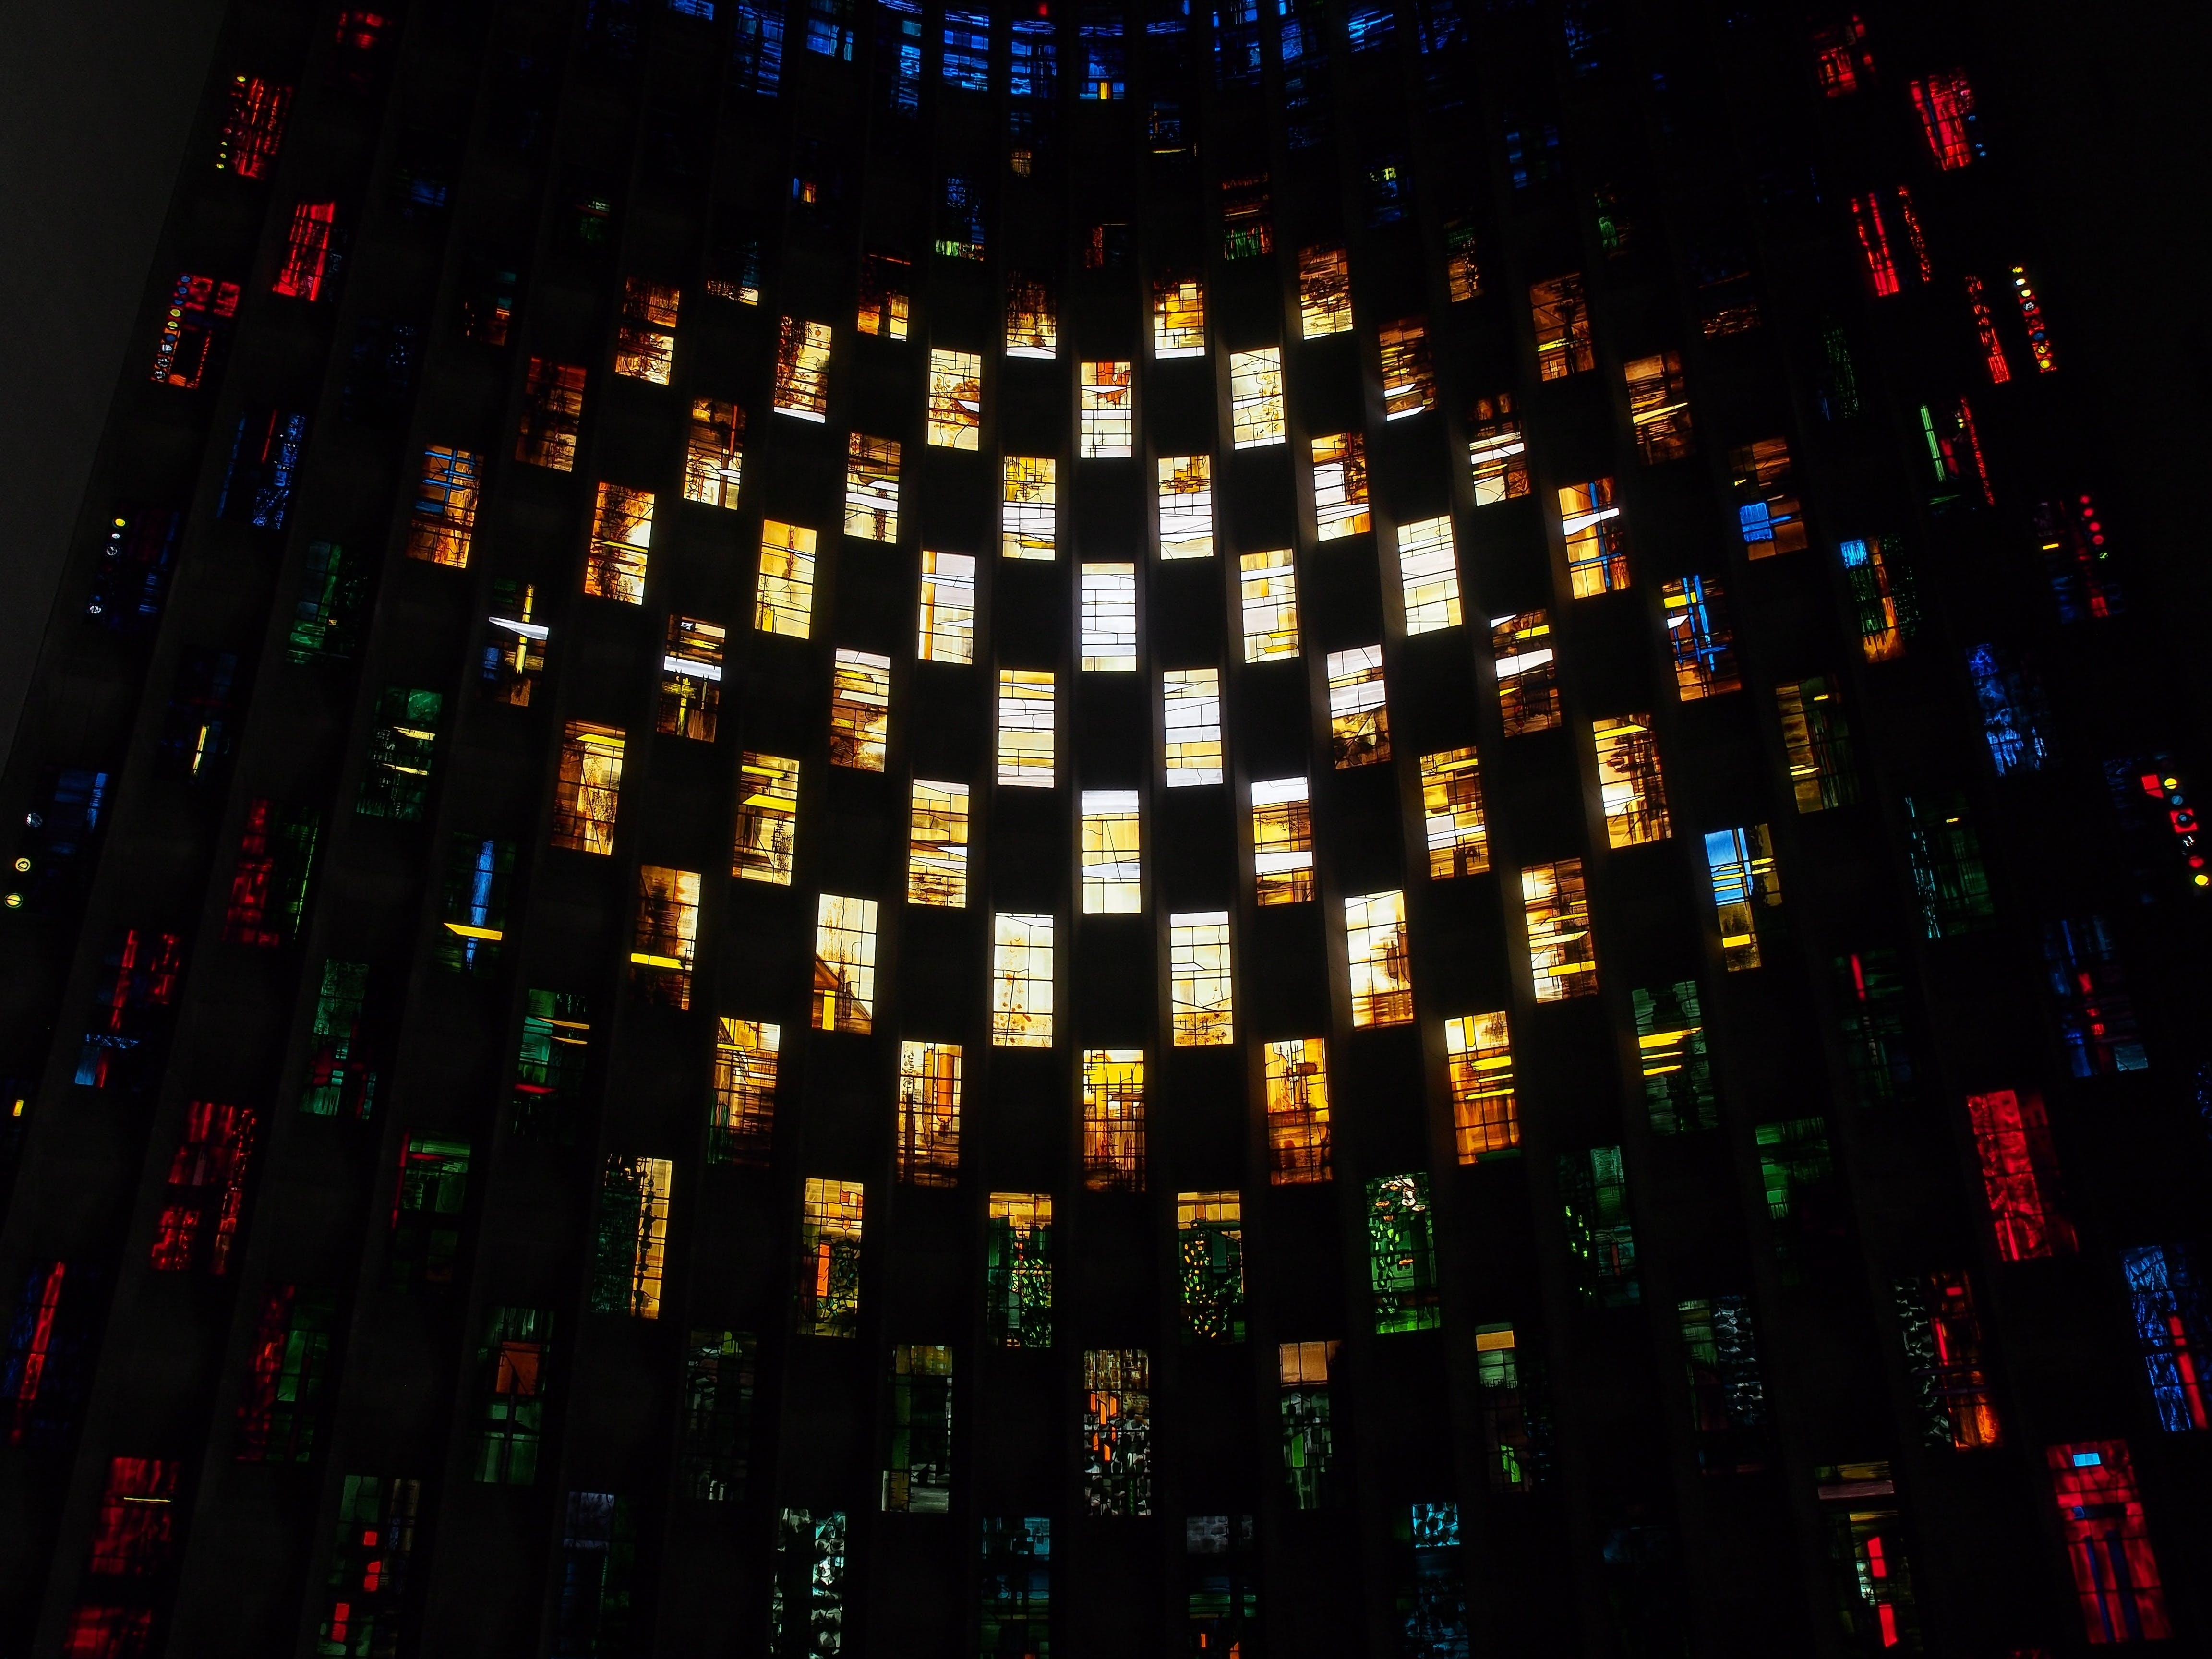 Free stock photo of light, creative, pattern, glass